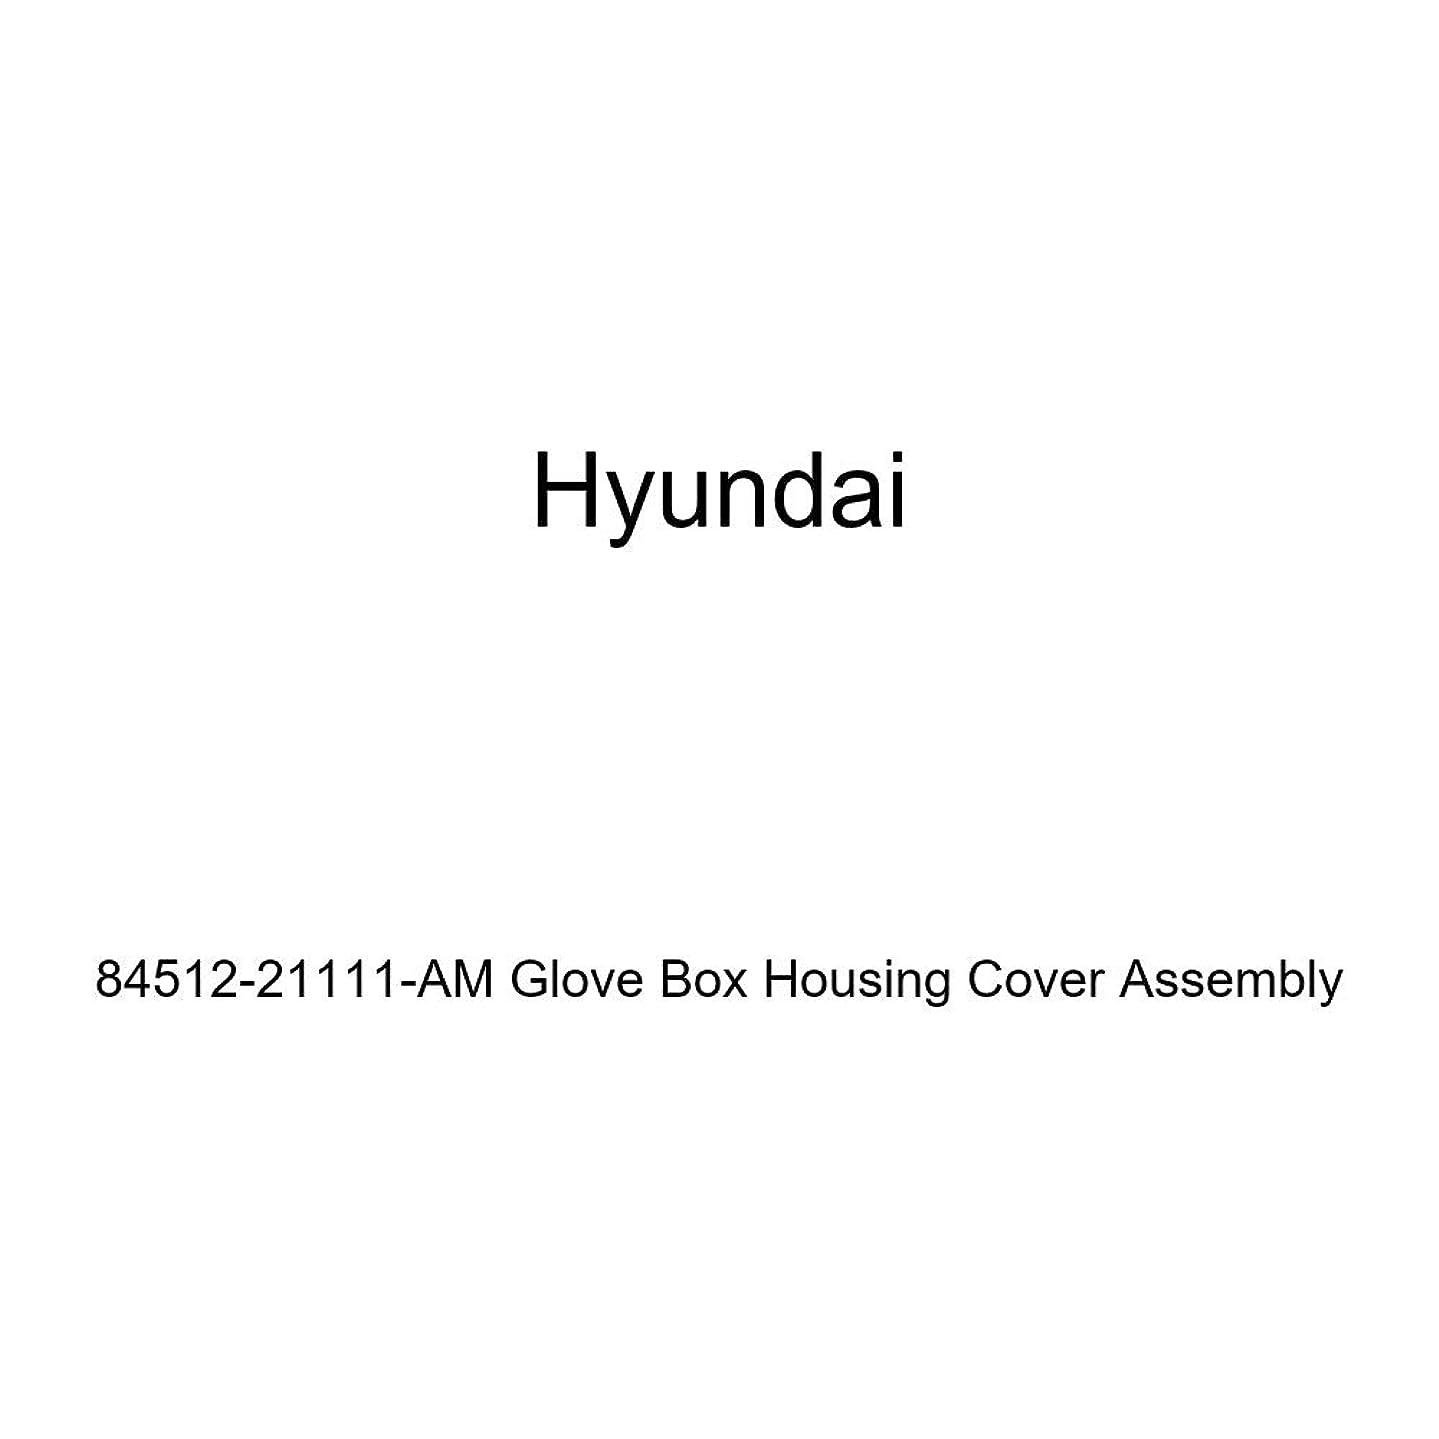 Genuine Hyundai 84512-21111-AM Glove Box Housing Cover Assembly